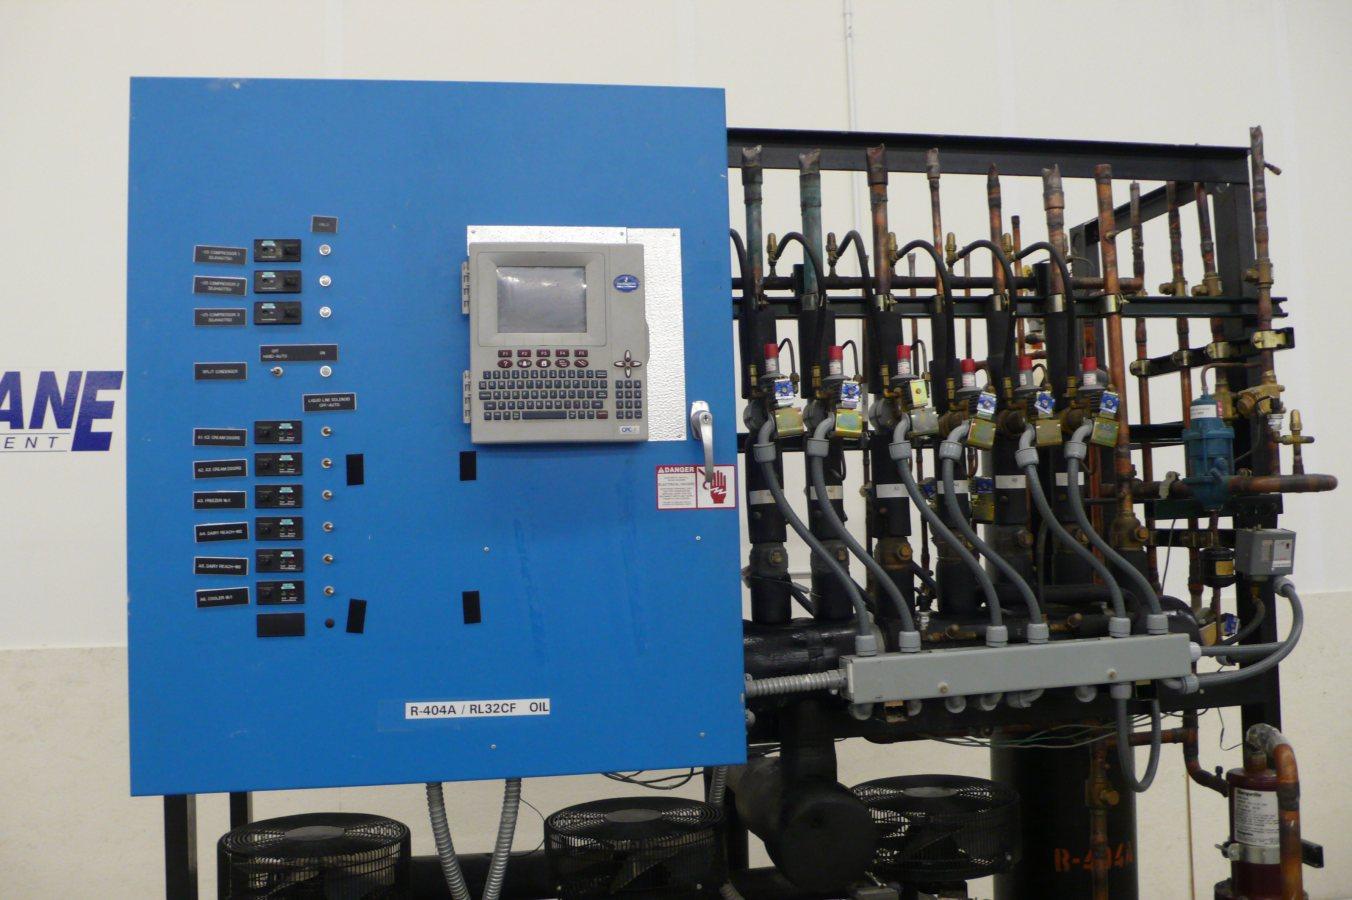 copeland discus wiring diagram rj45 cat6 zero zone 22 5 hp low temp freezer refrigeration rack